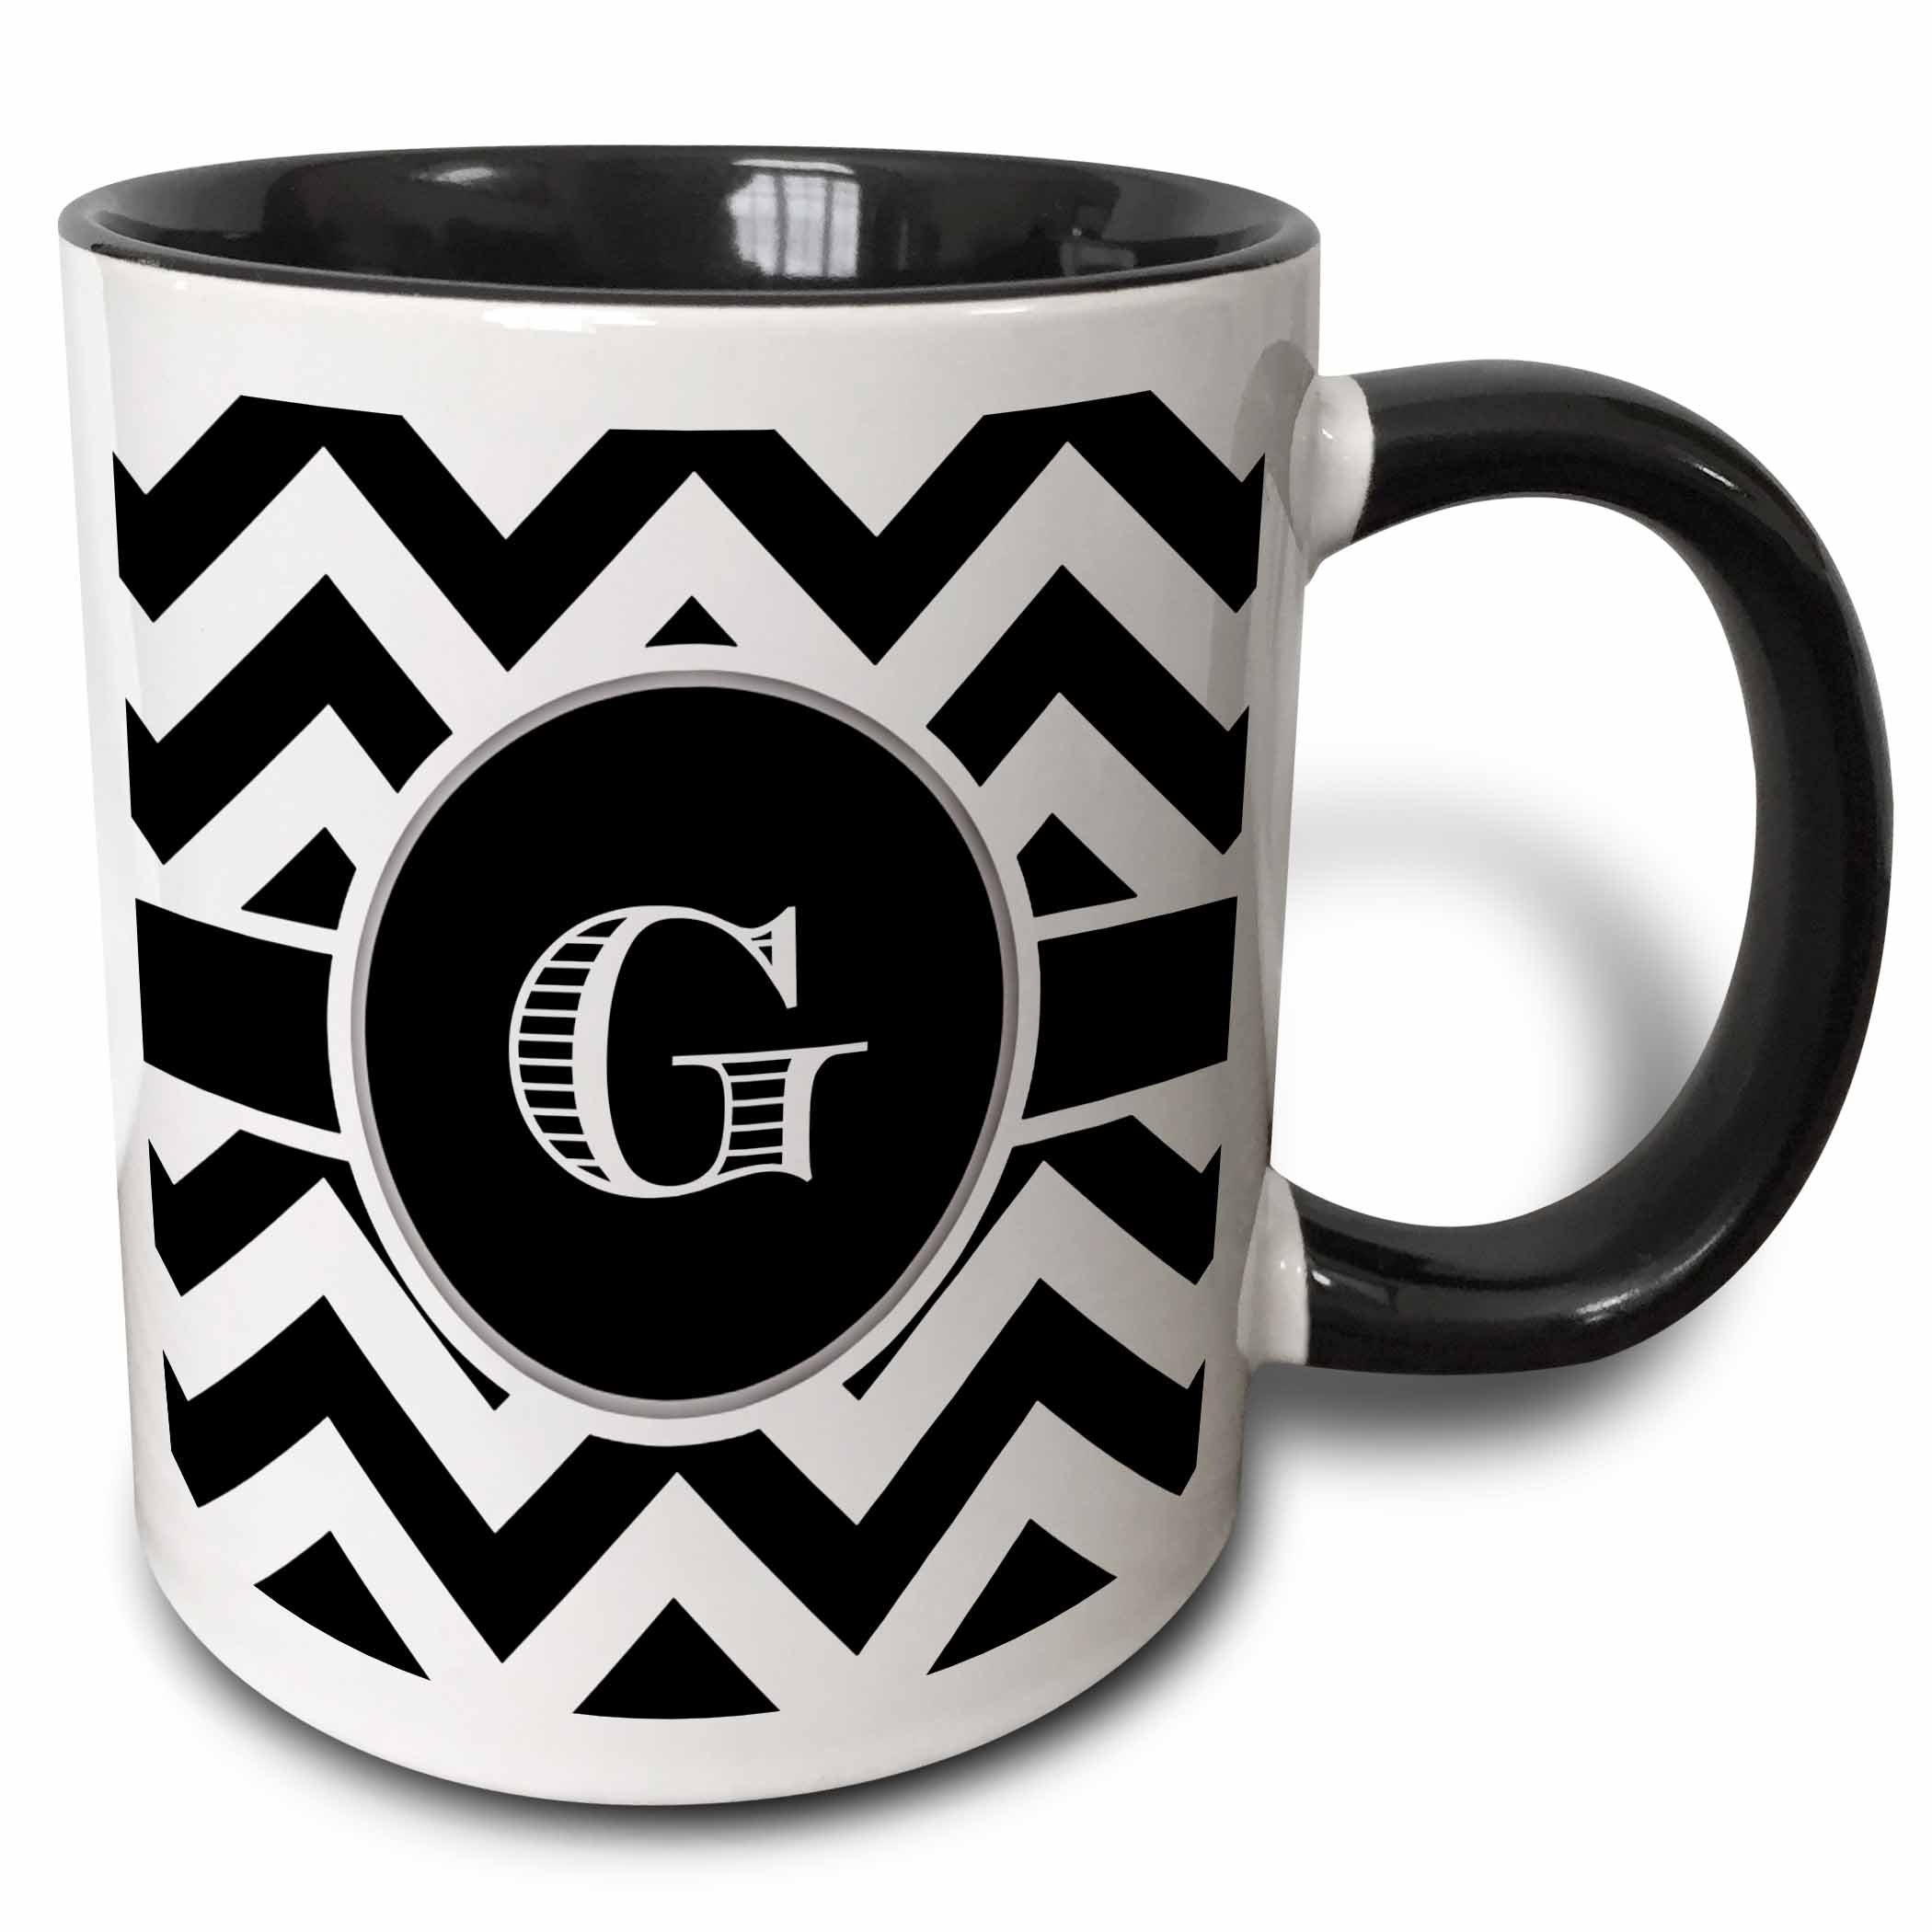 3dRose Black and White Chevron Monogram Initial G Mug, 11 oz